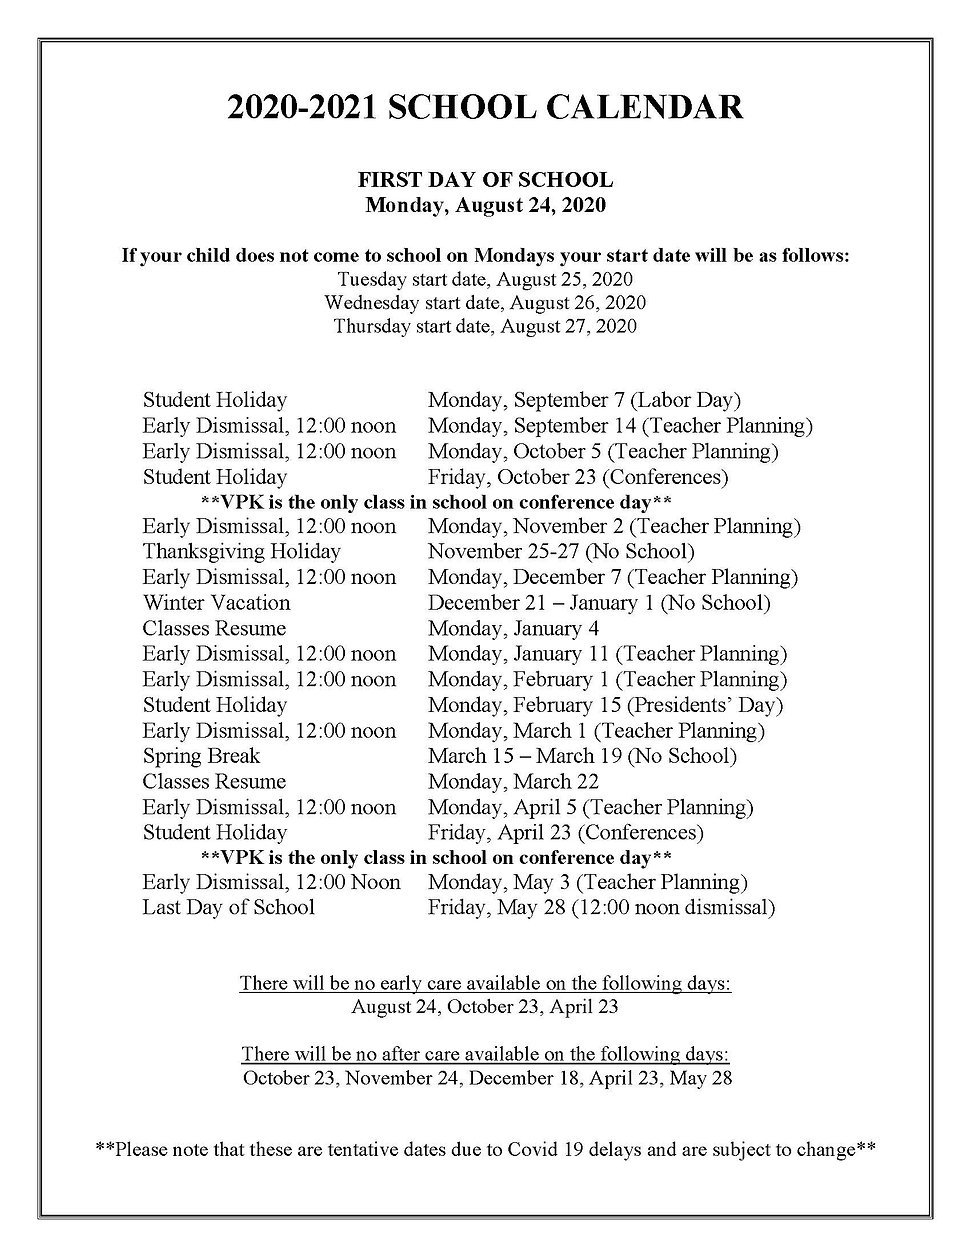 School Calendar 2020-2021-covid (1).jpg